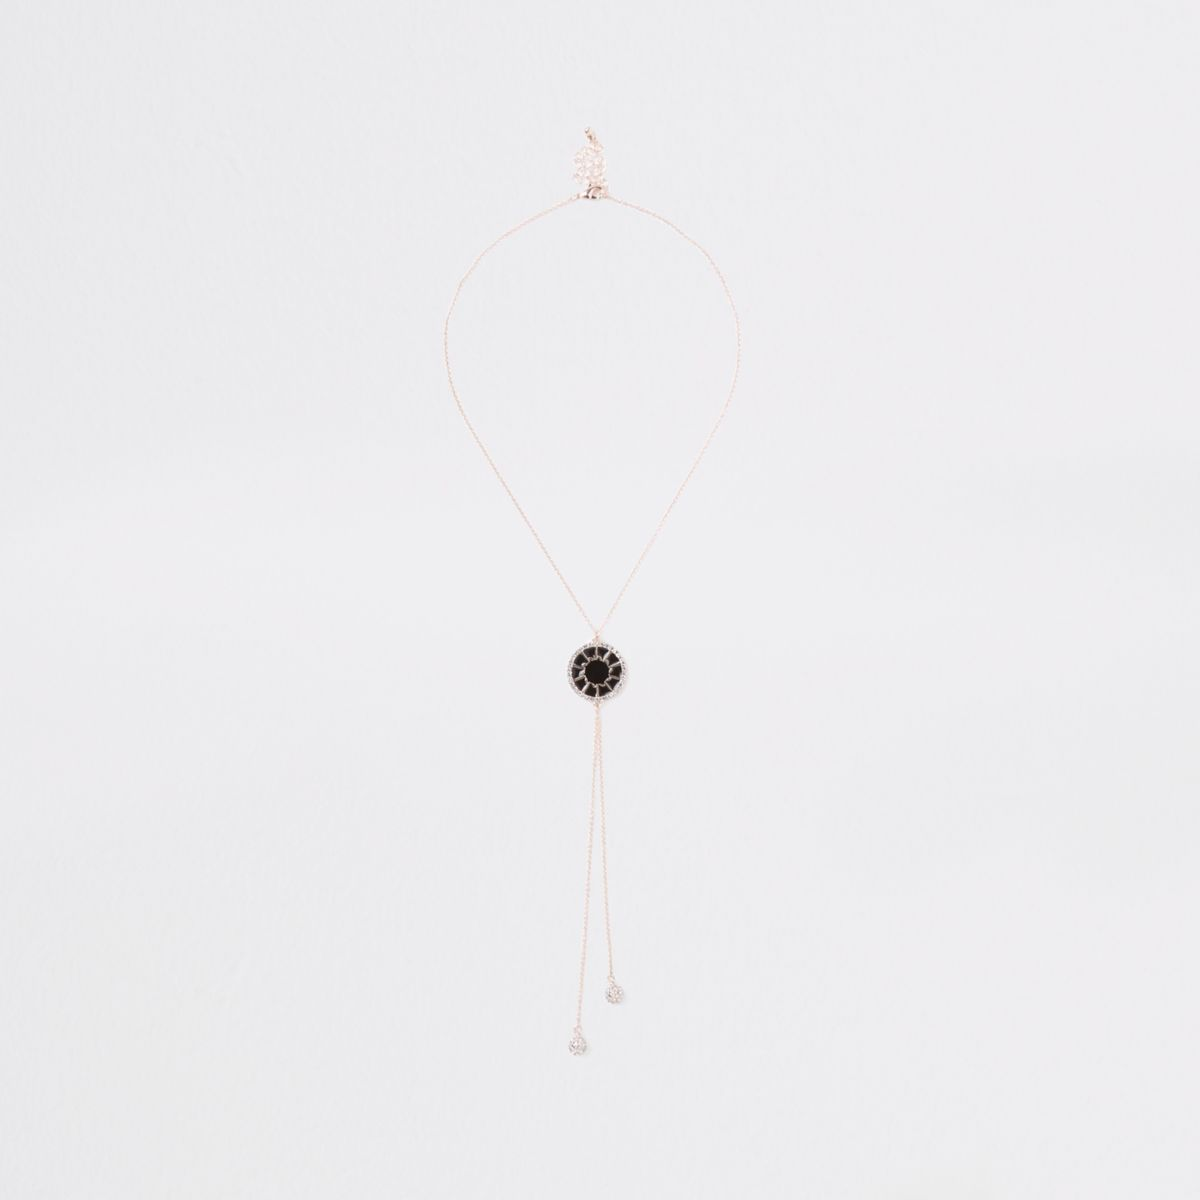 Rose gold black enamel circle necklace